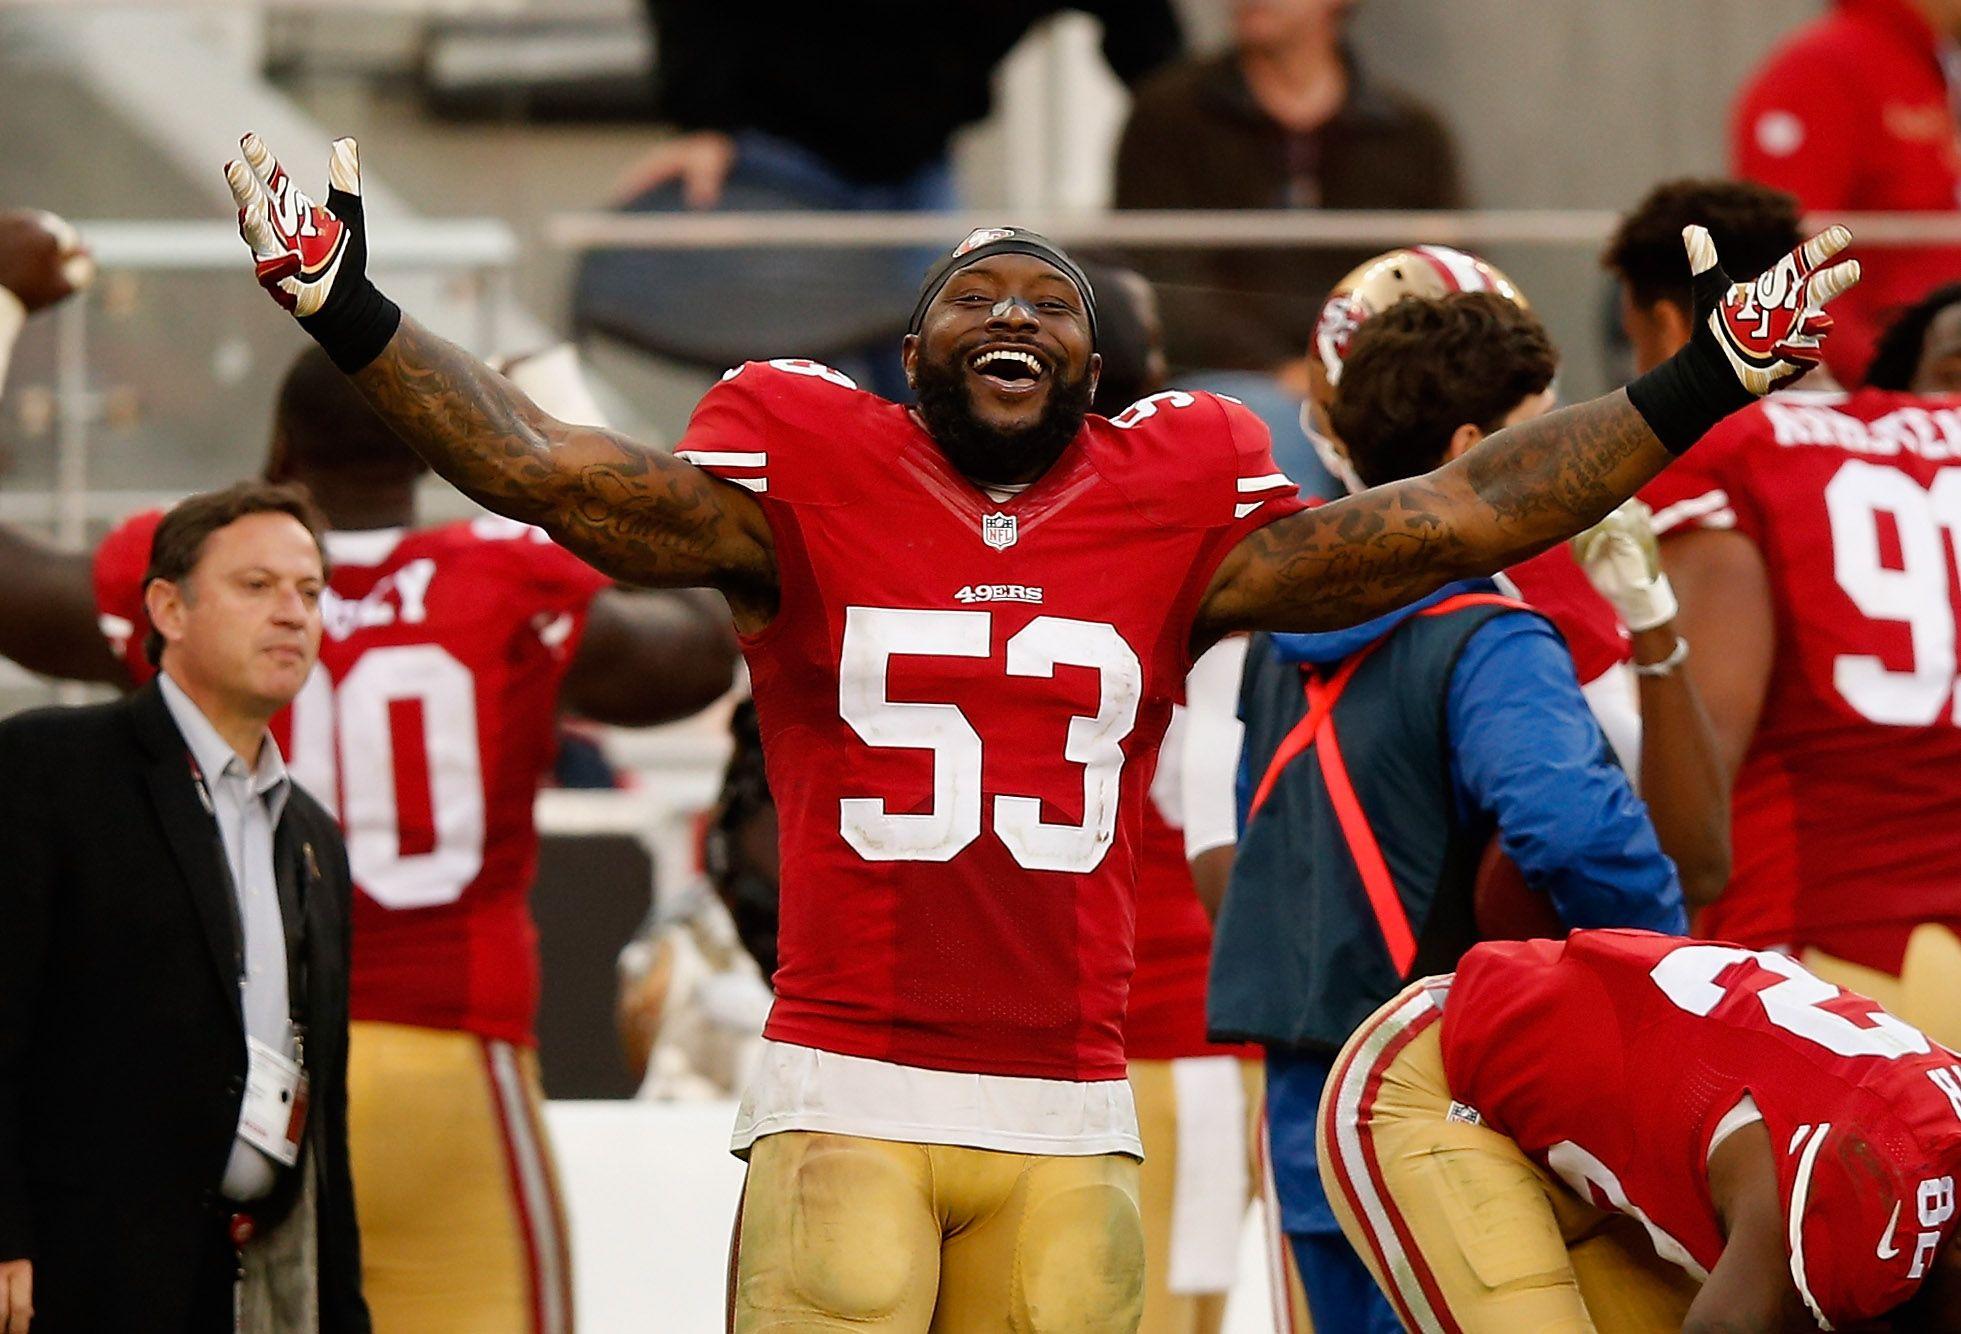 Santa Clara Ca November 08 Navorro Bowman 53 Of The San Francisco 49ers Reacts In The Closing Moments Of Their Win Over The A Golden Nugget Navorro Bowman Atlanta Falcons